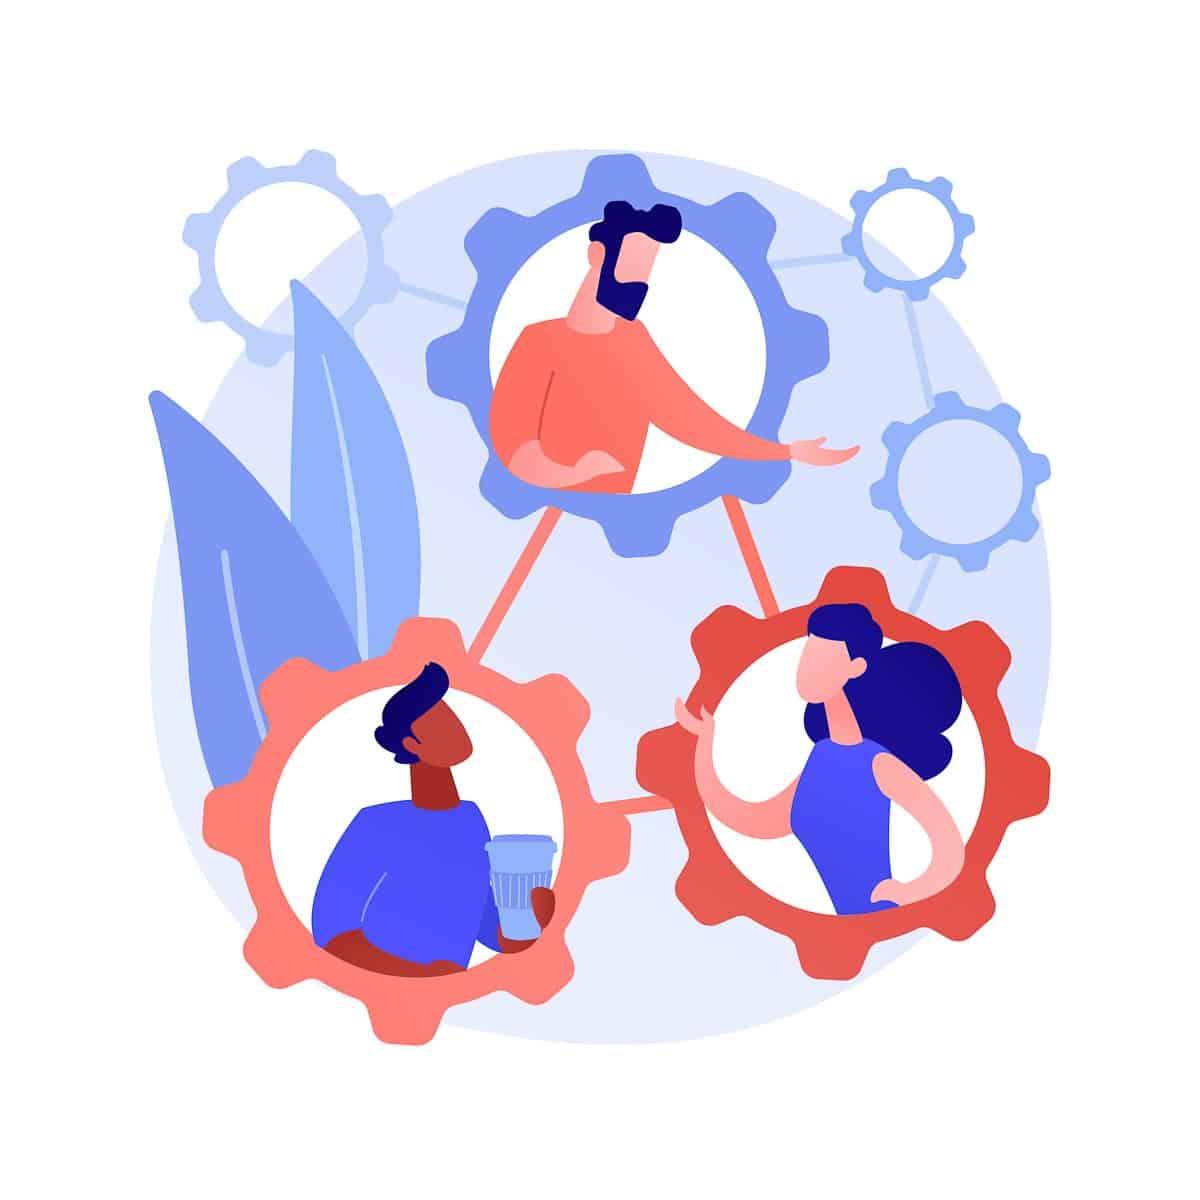 Social development abstract concept vector illustration.